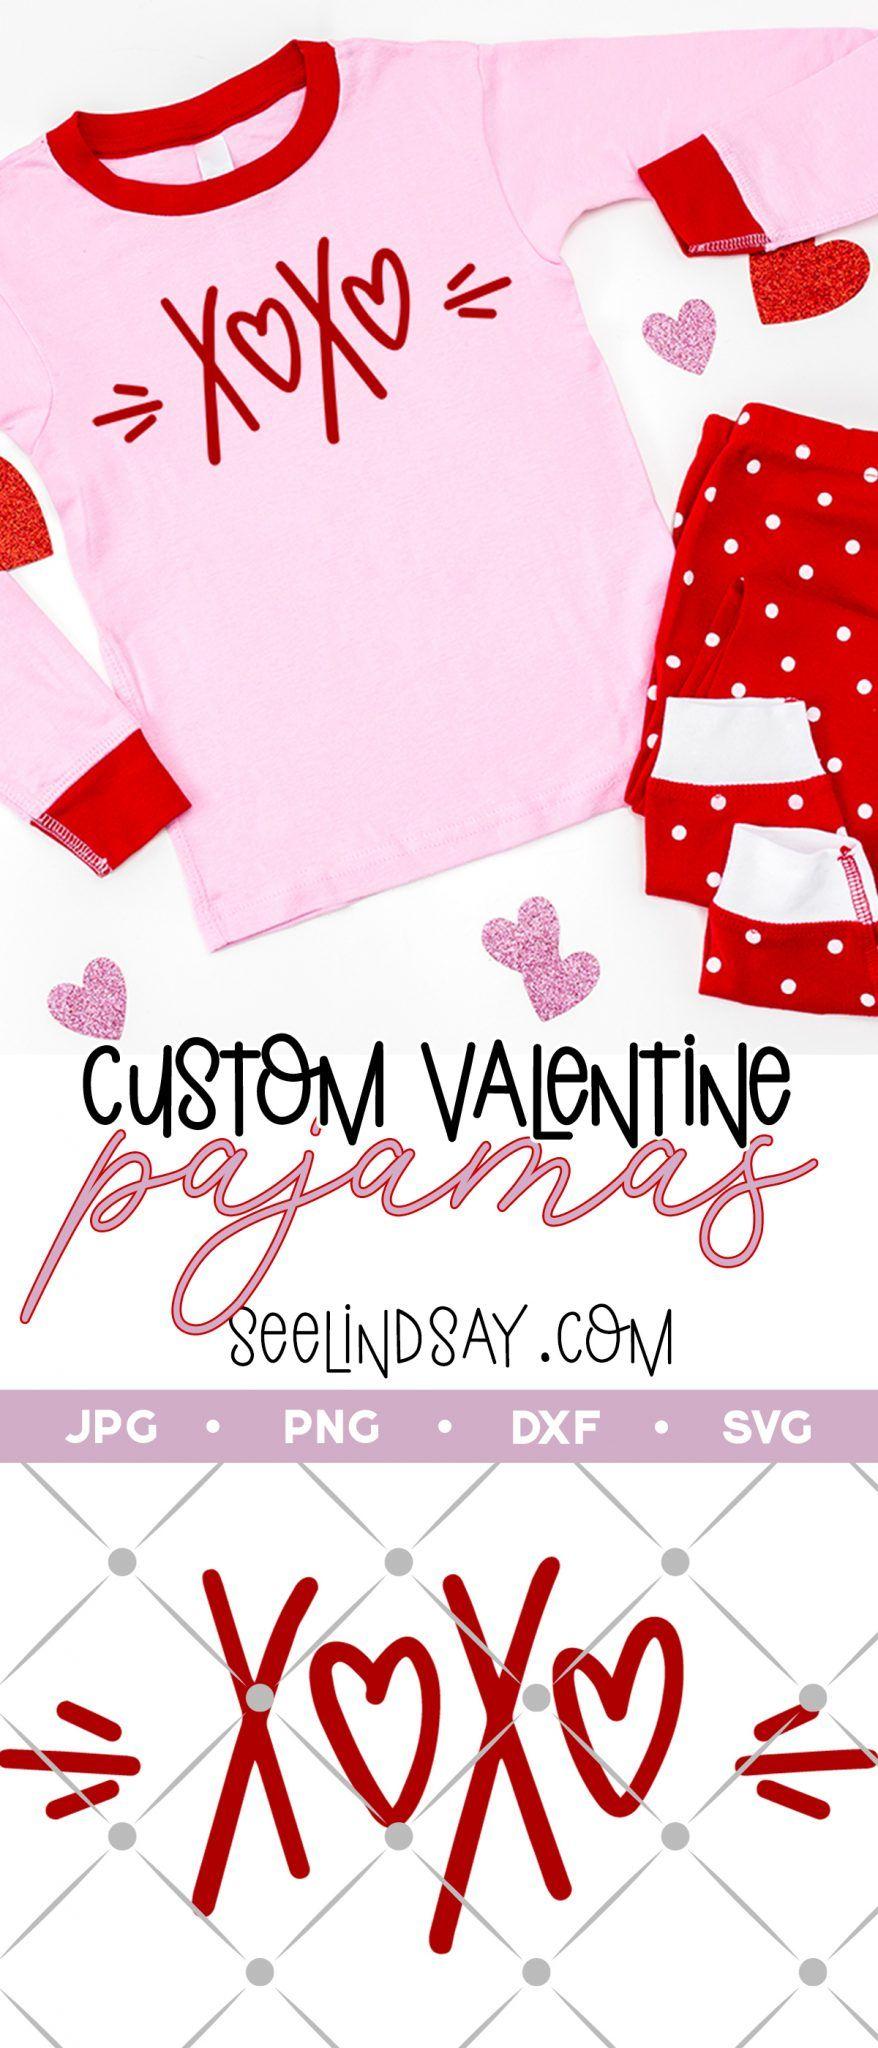 socuteappliques boys valentines day svg cute Cactus SVG Free hugs svg design Valentine SVG valentines day clipart Valentines day